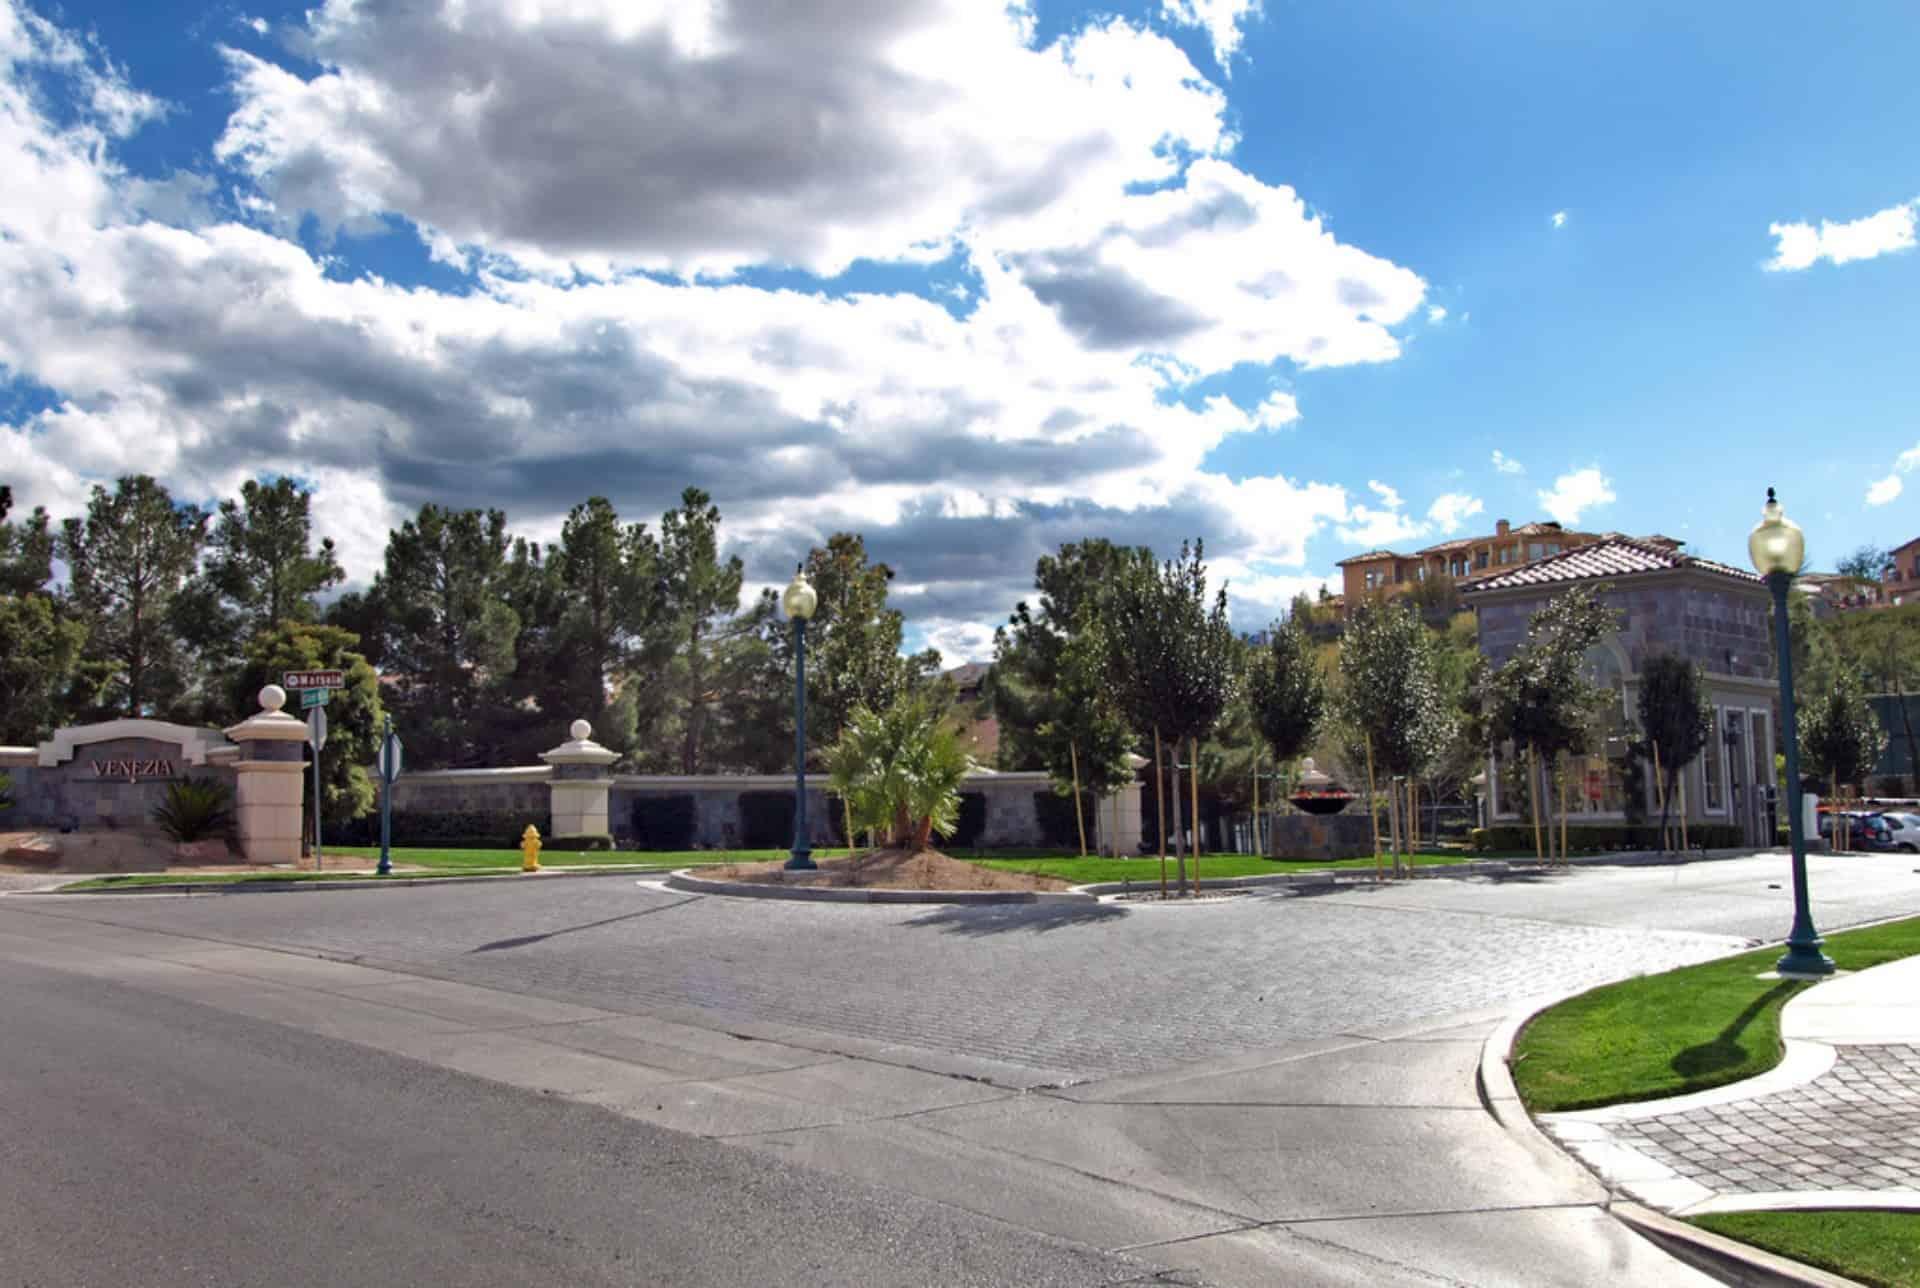 seven-hills-marquis-rob-jensen-company-guard-gated-real-estate-summerlin-las-vegas-henderson-16